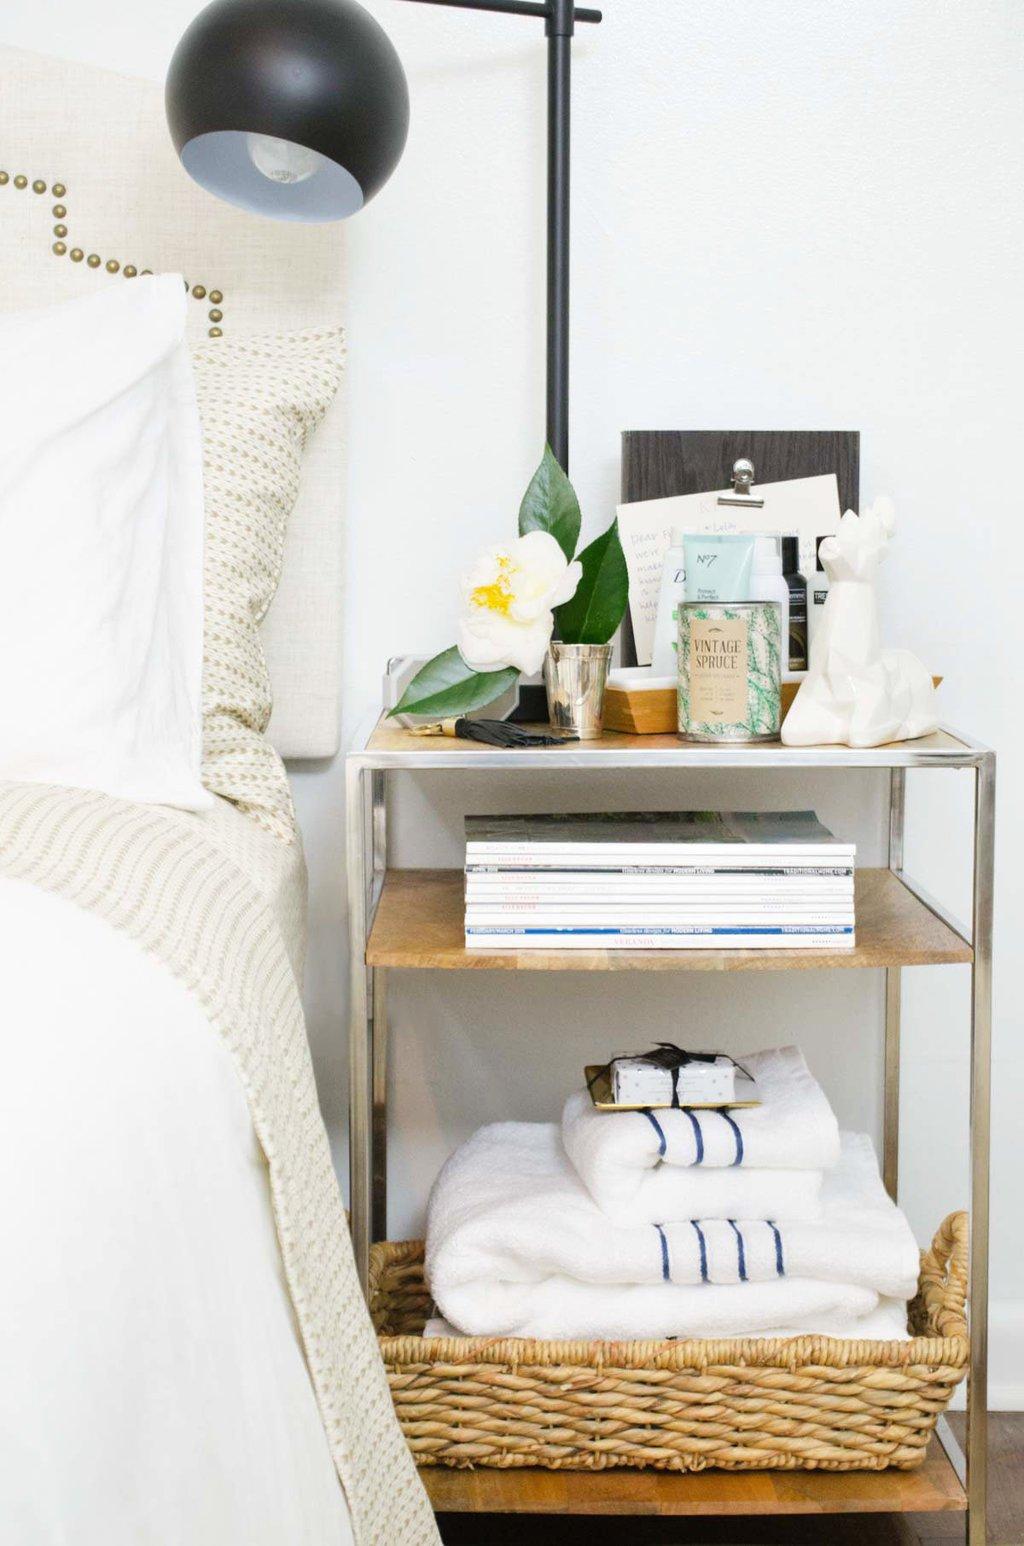 Guest bedroom bedside table amenities via @thouswellblog